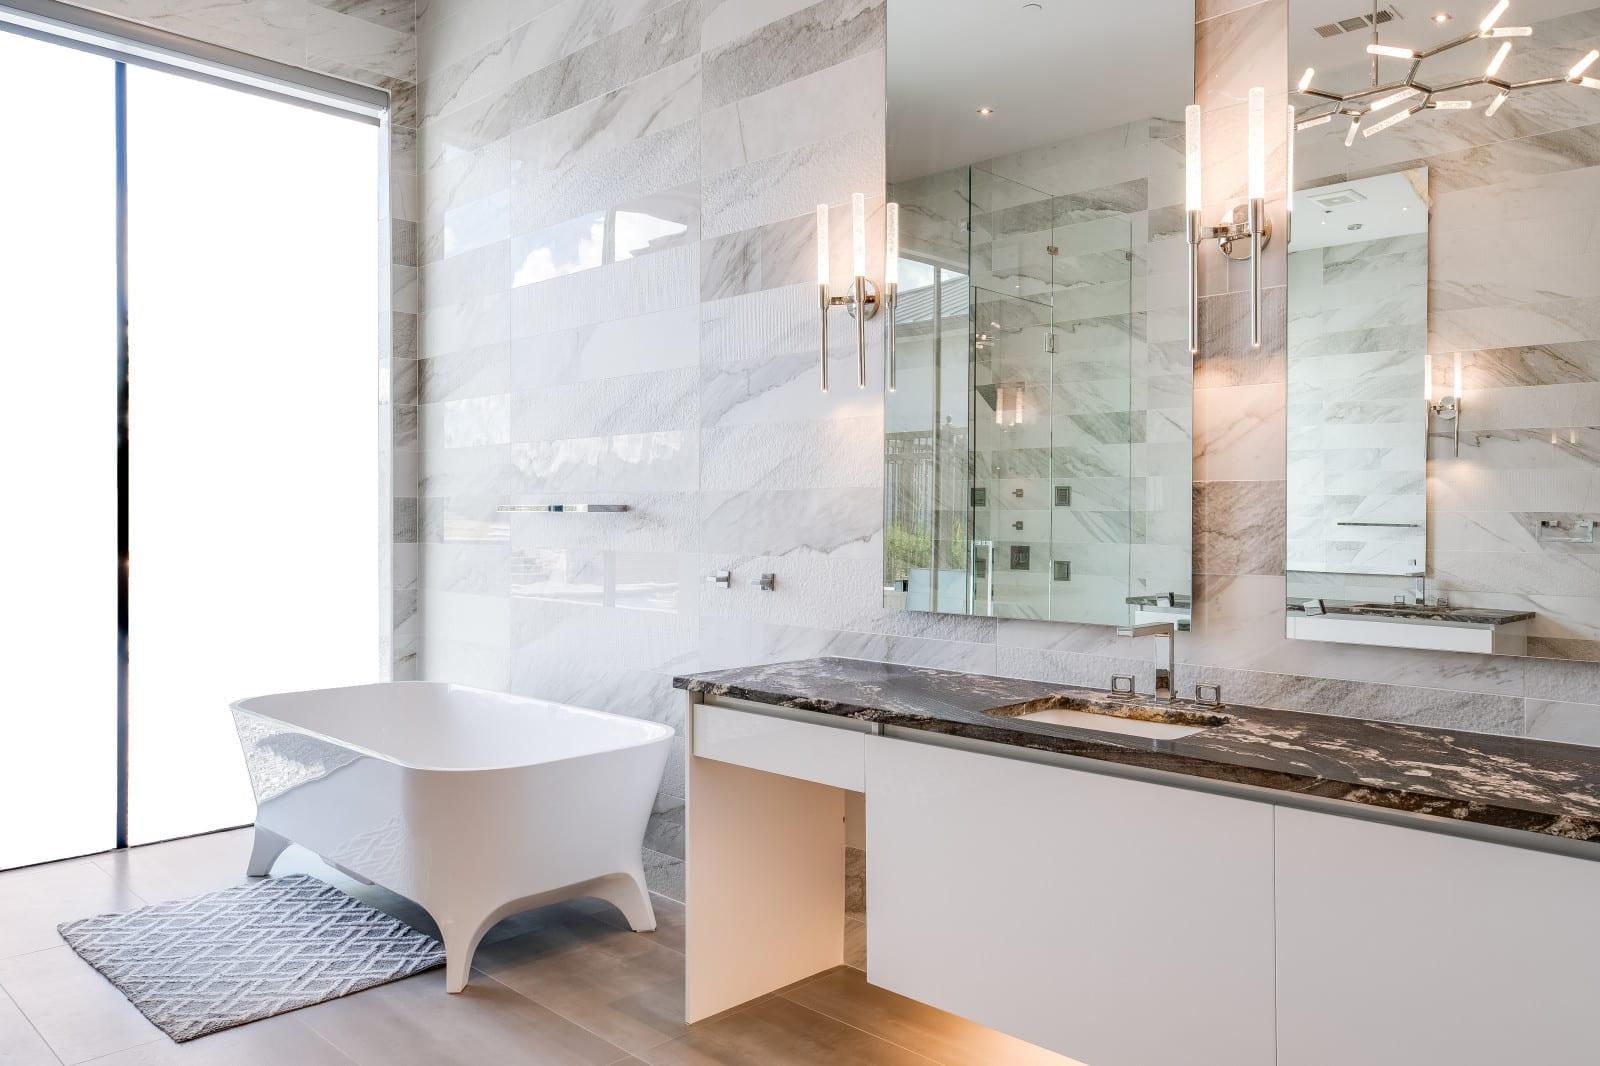 Custom Home Build and Interior Design # 27 - Millennial Design + Build, Home Builders in Dallas Texas, modern style homes, and custom home builders in DFW